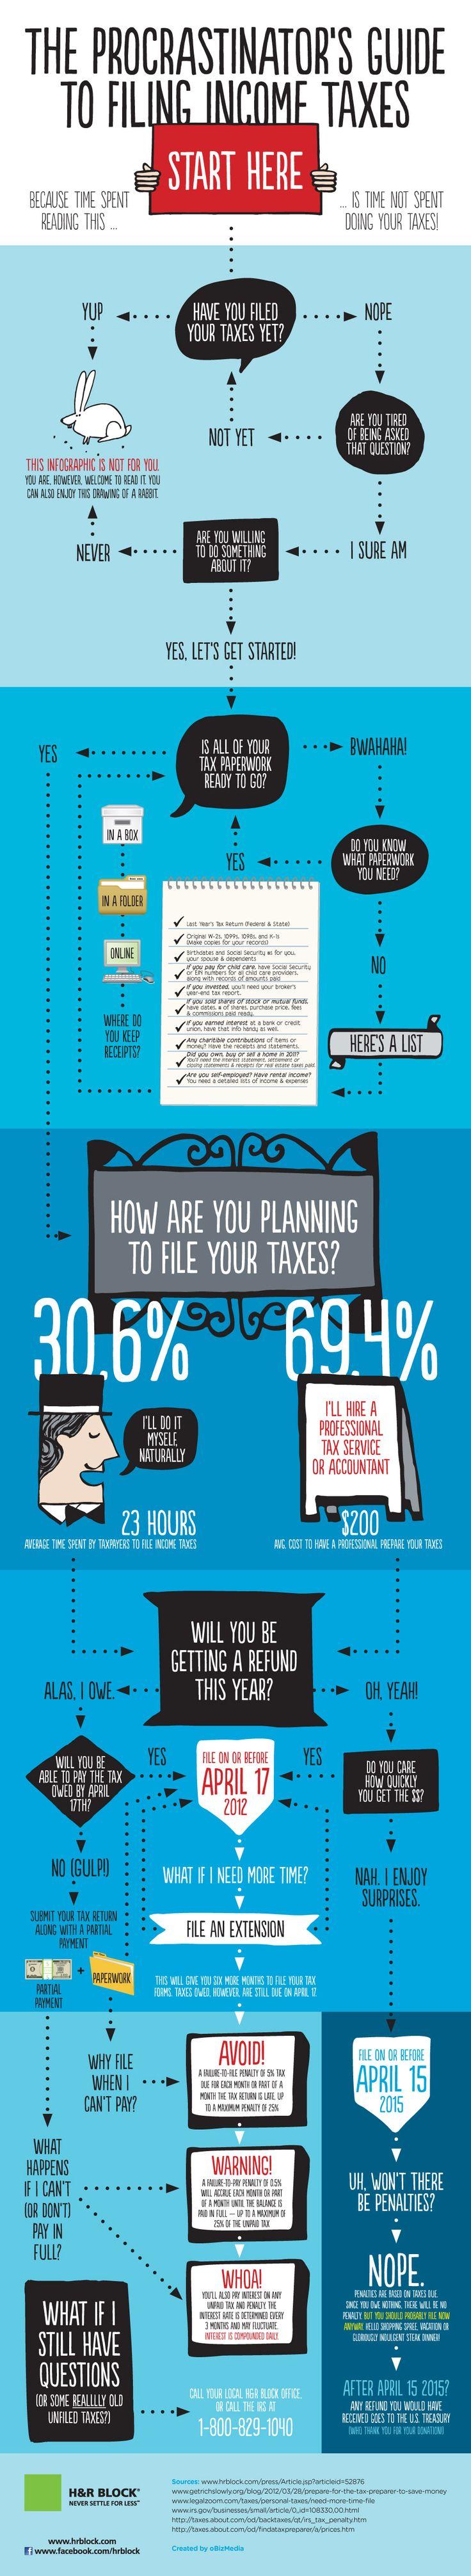 irs tax software